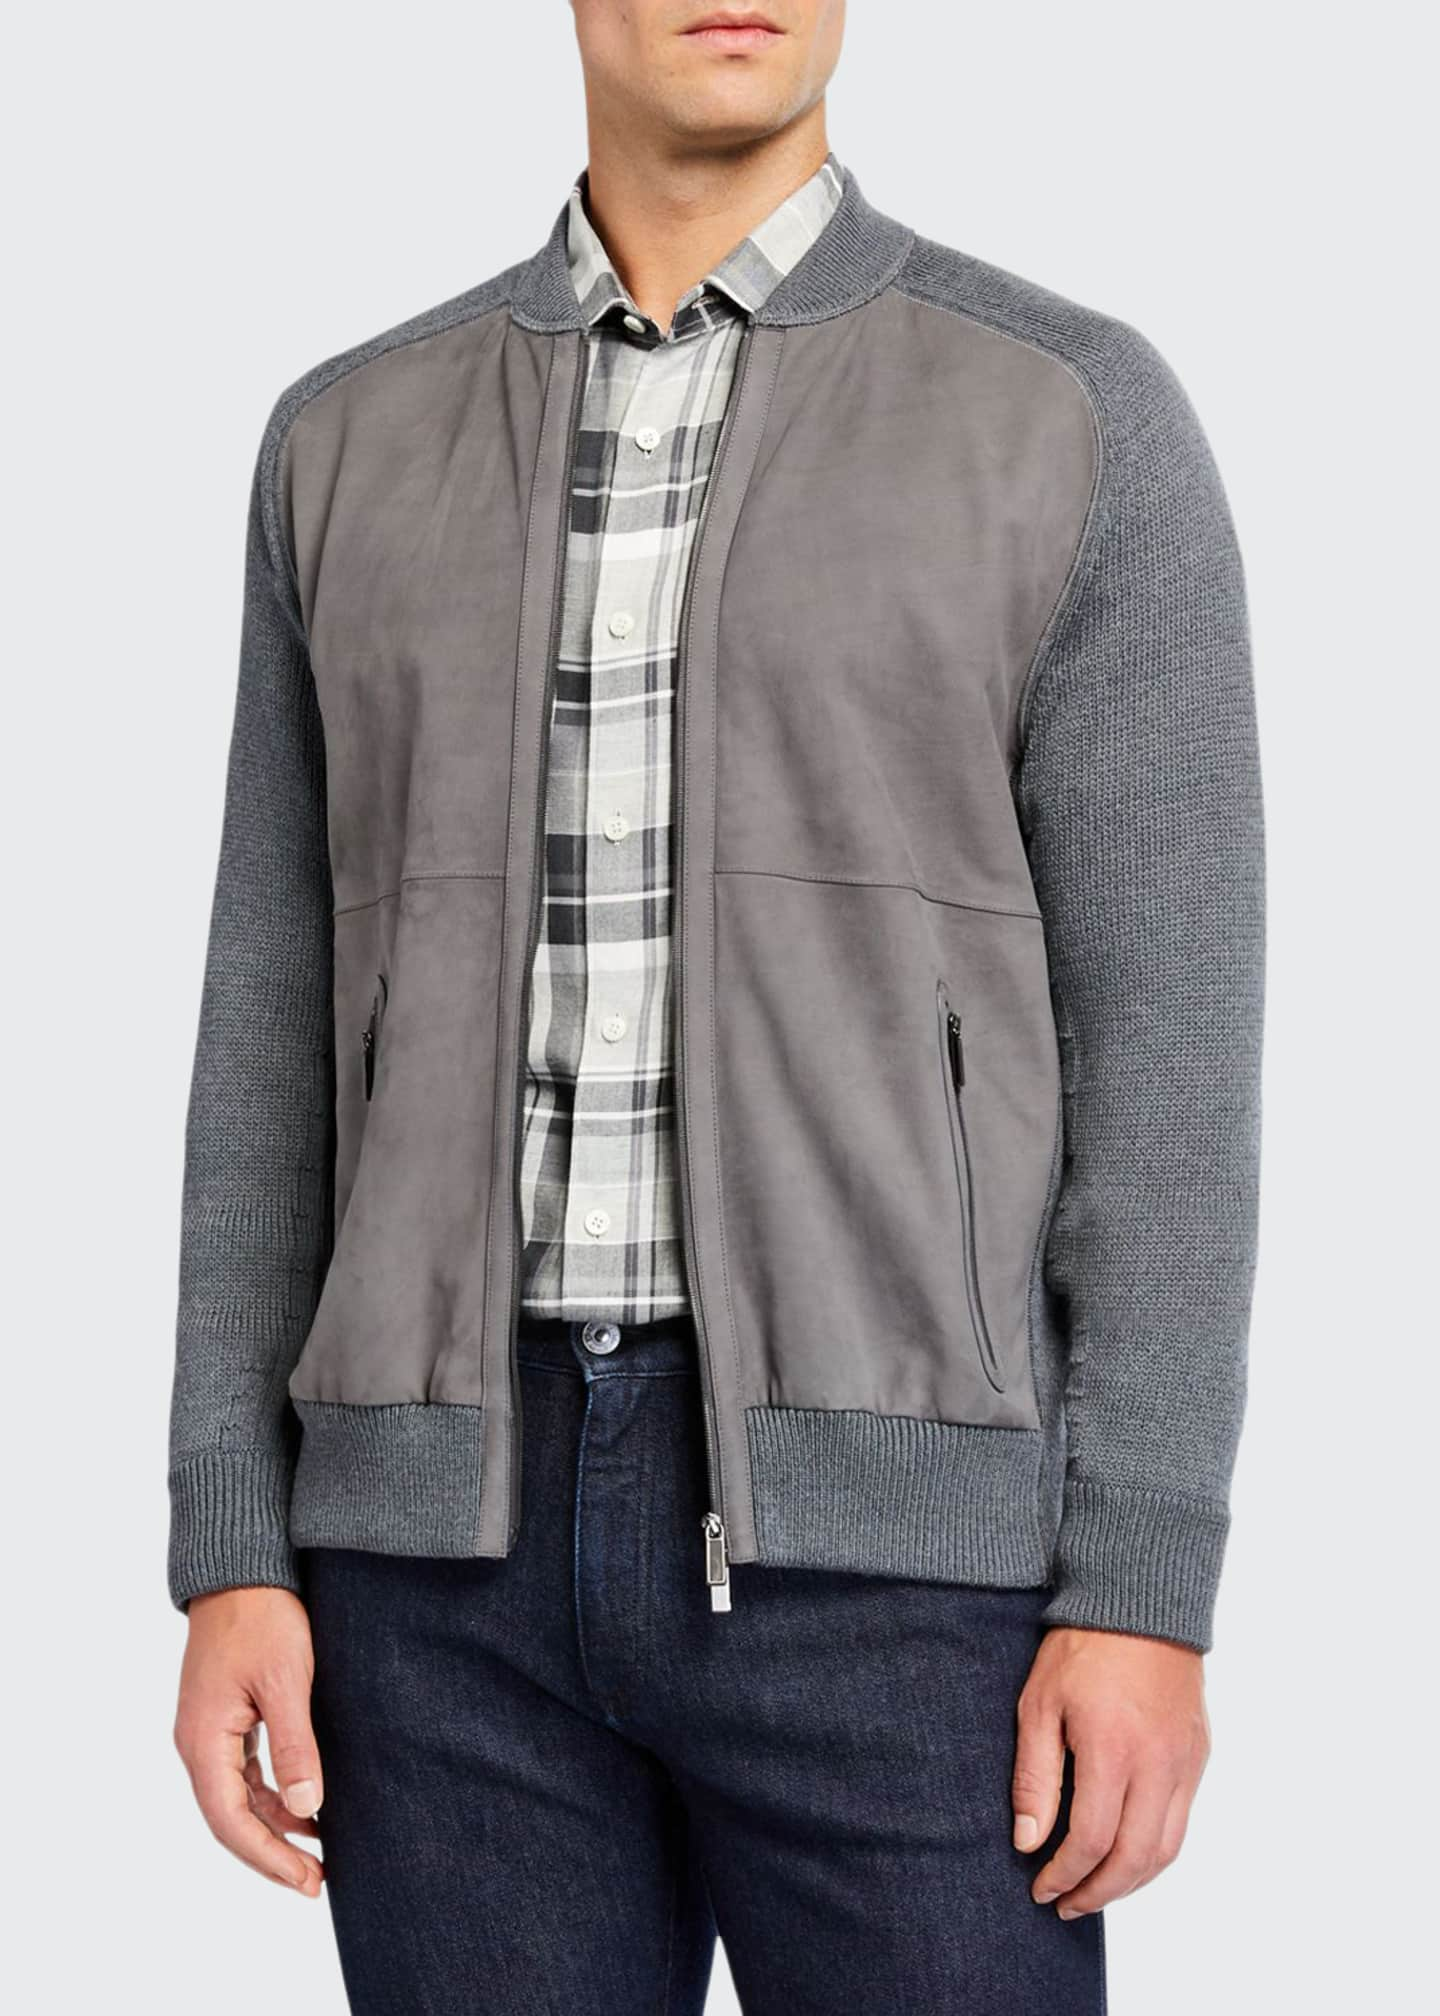 Ermenegildo Zegna Men's High-Performance Leather/Wool Zip Sweater